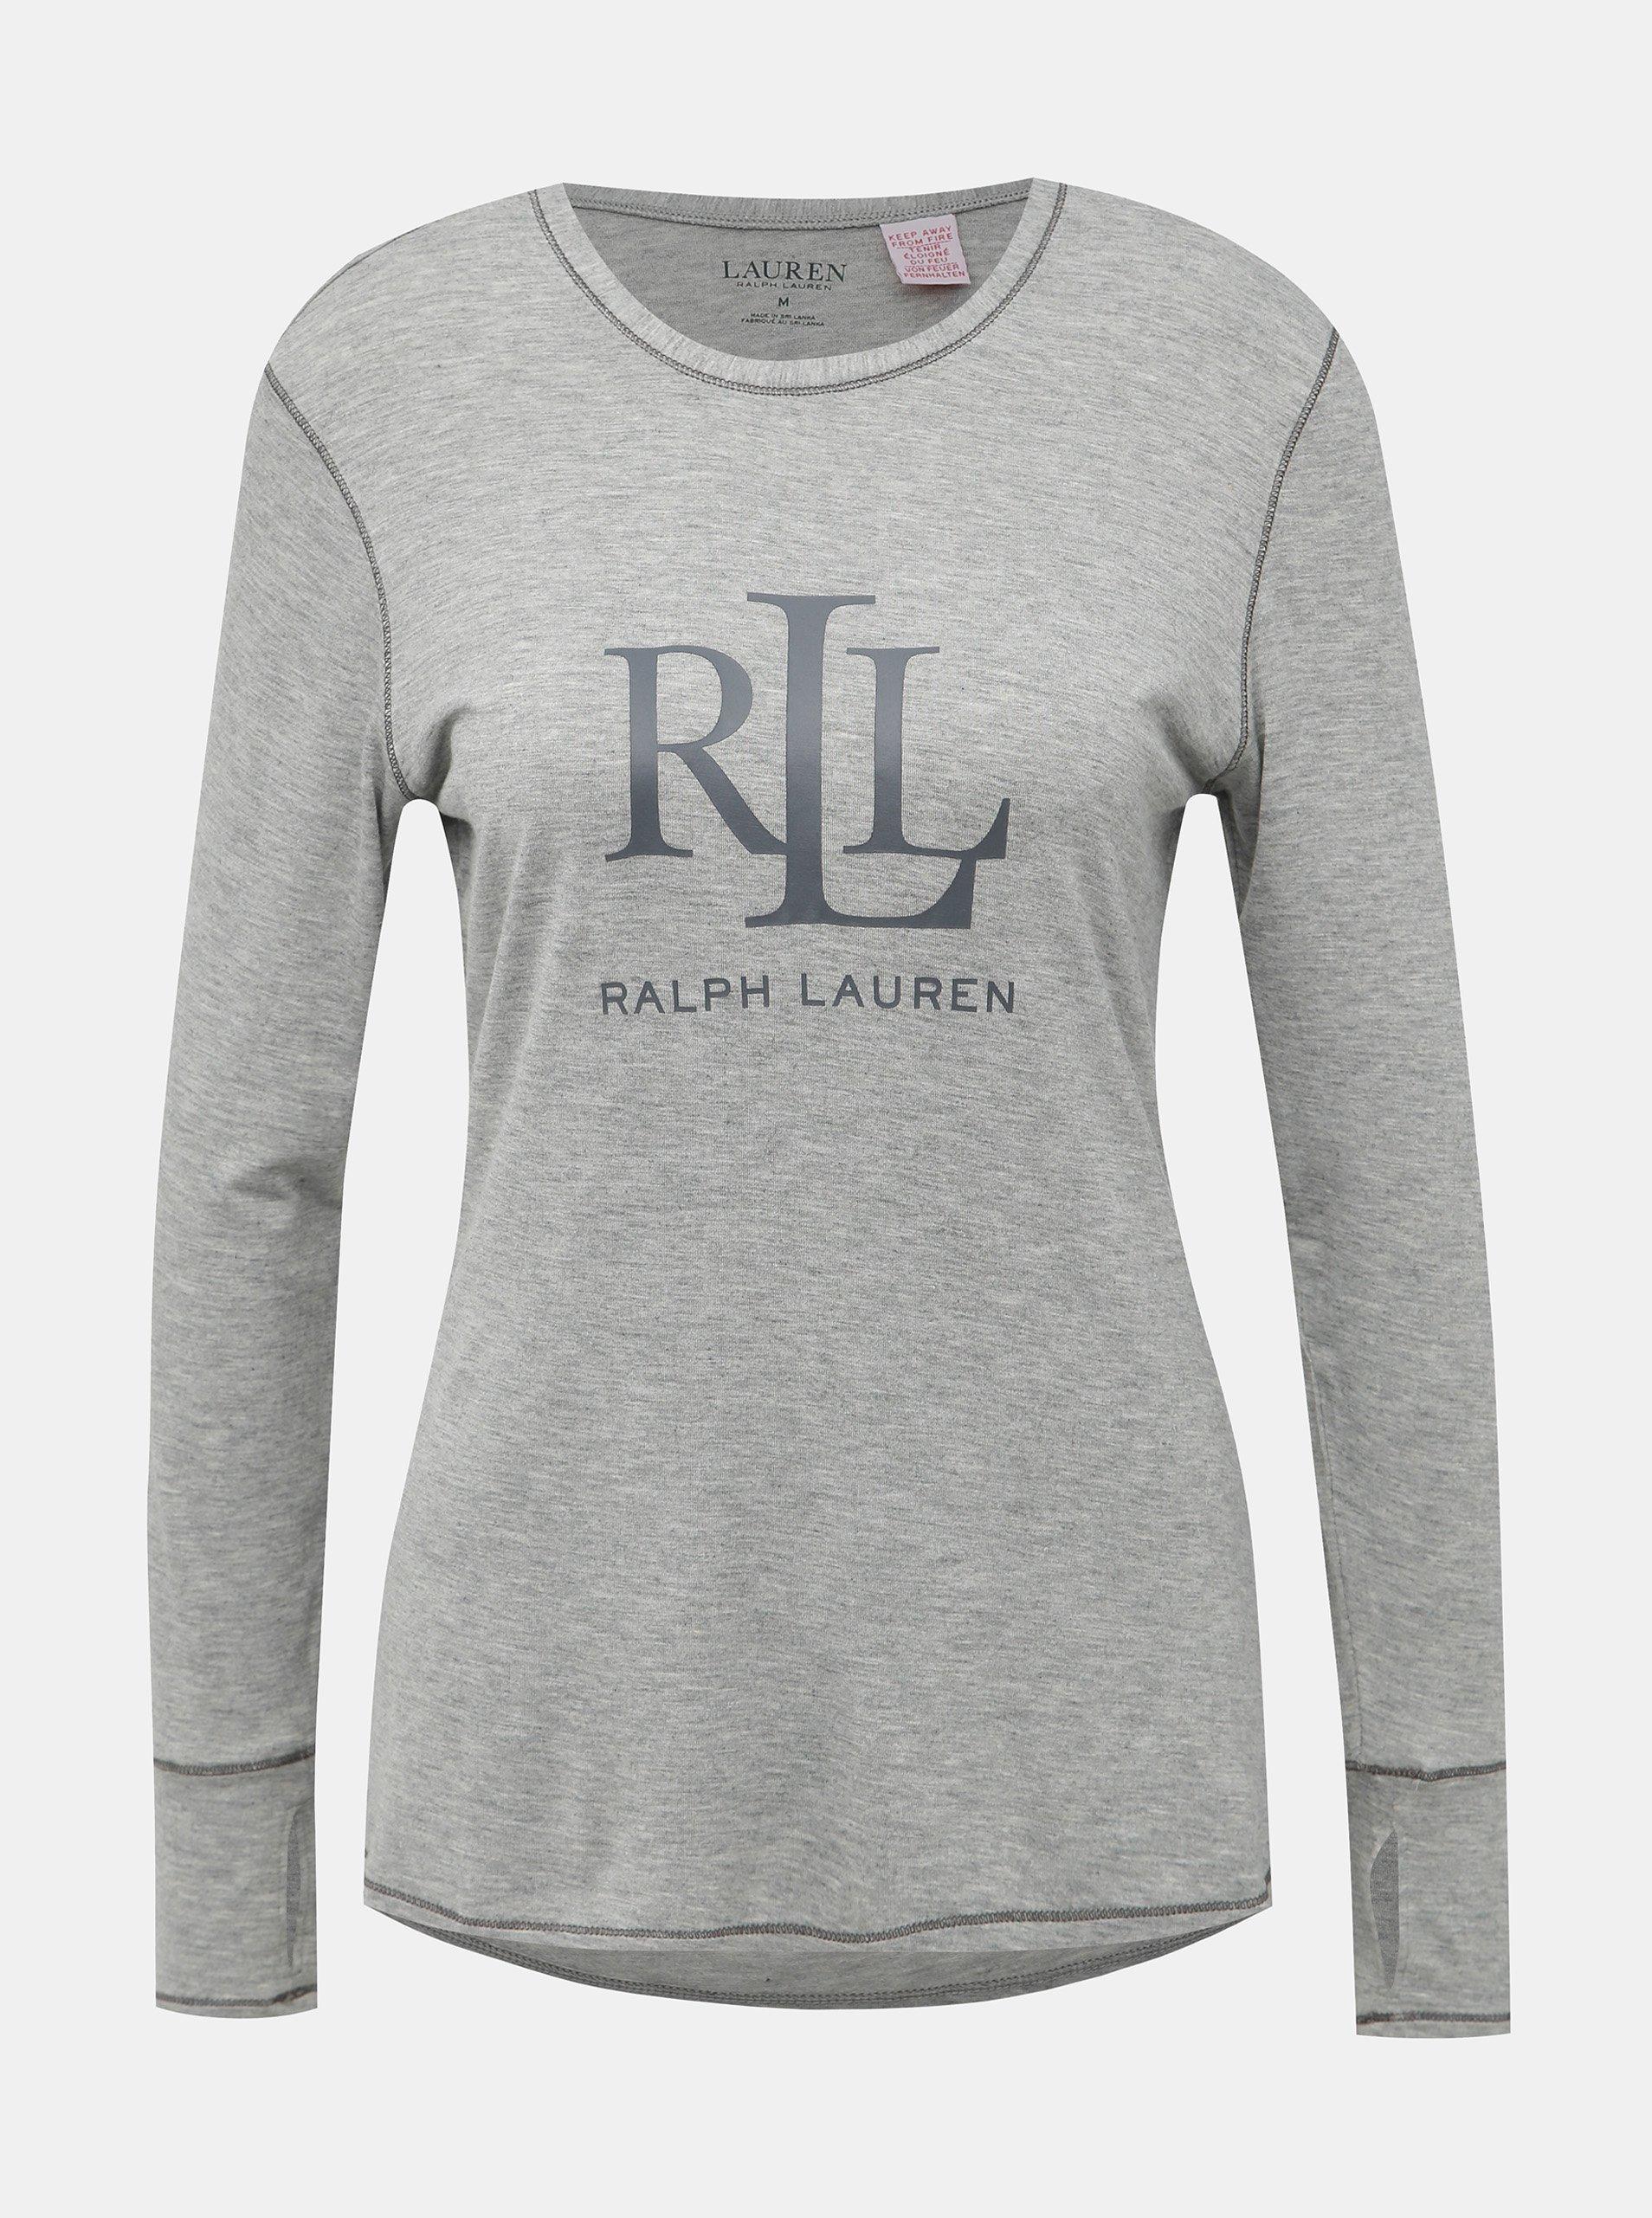 Šedé dámske pyžamové tričko s potlačou Lauren Ralph Lauren